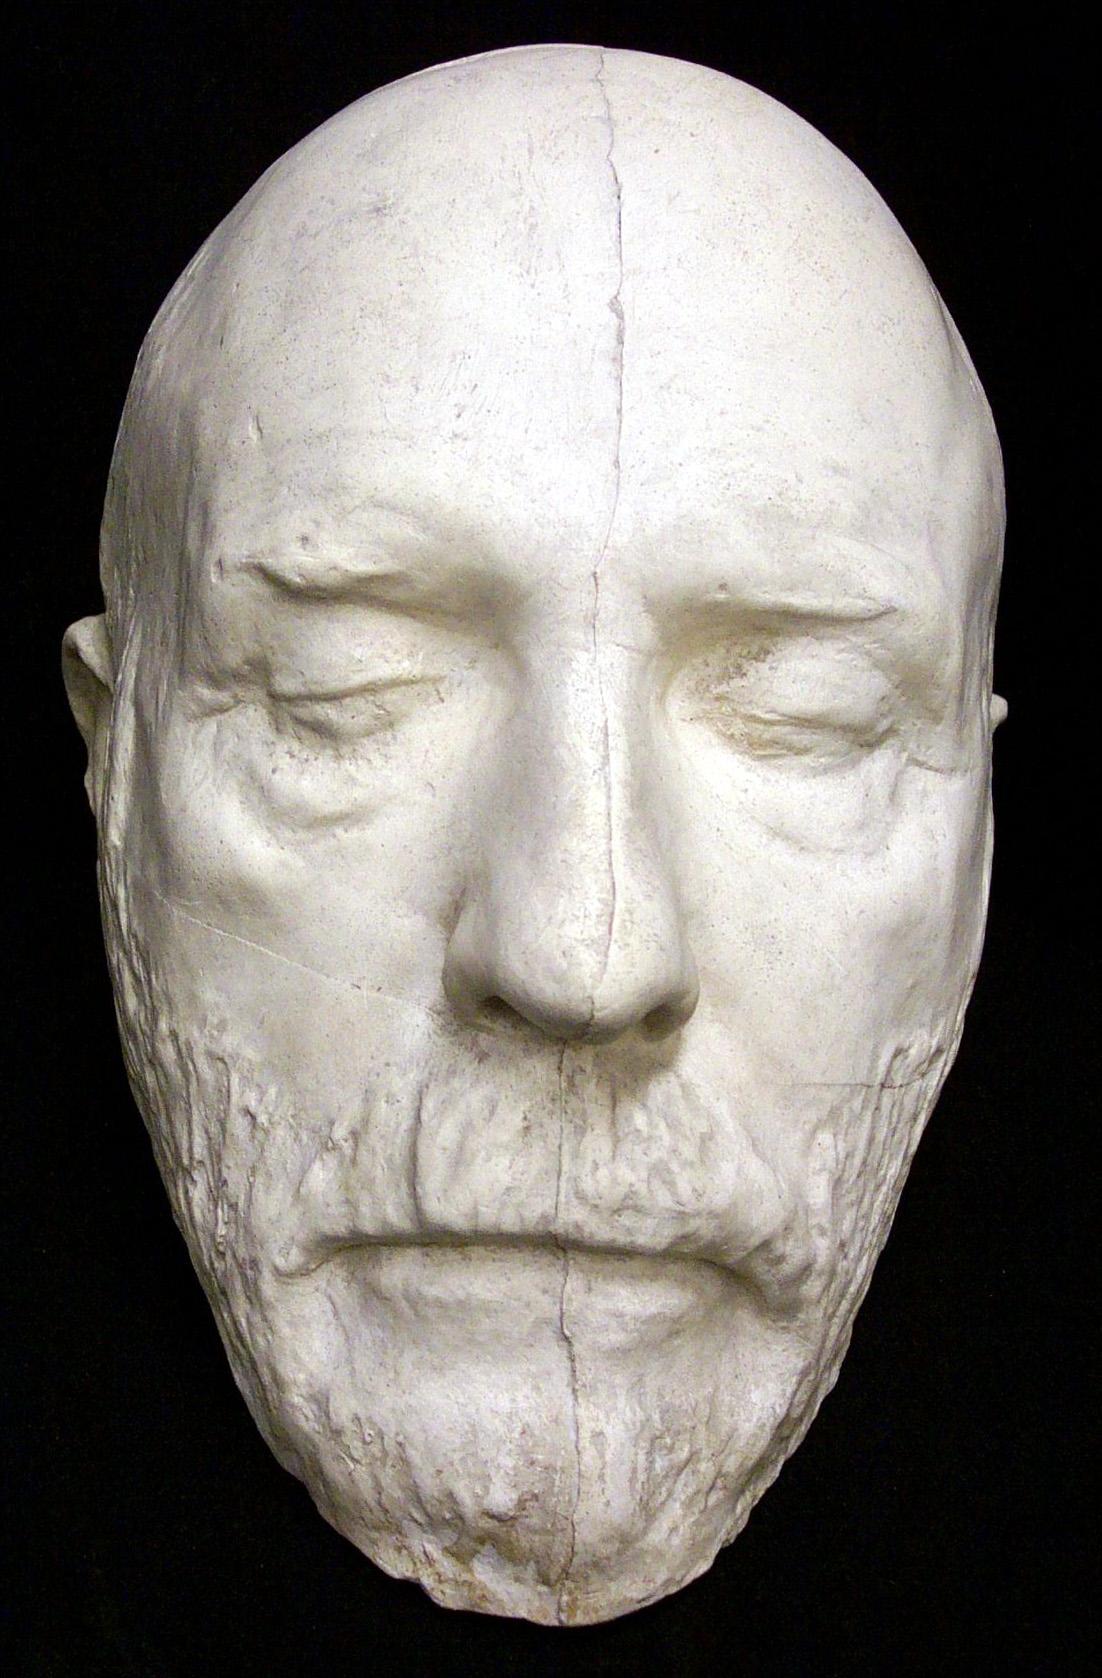 Ulysses S. Grant death mask ?   American Civil War ForumsQueen Elizabeth 1 Artifacts